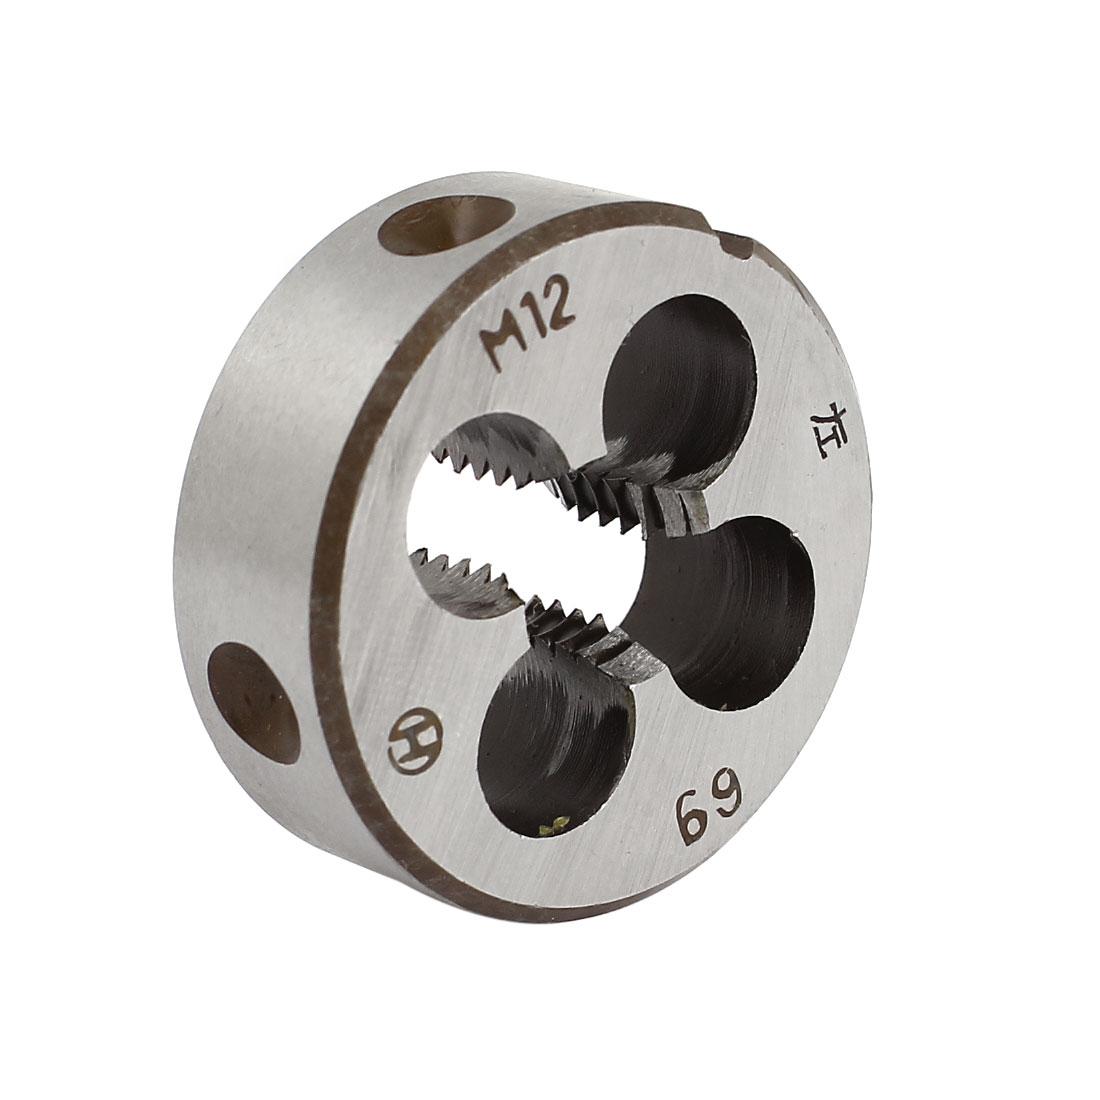 M12 Metric Screw 38mm OD Dia Steel Round Threading Die Thread Cutting Tool